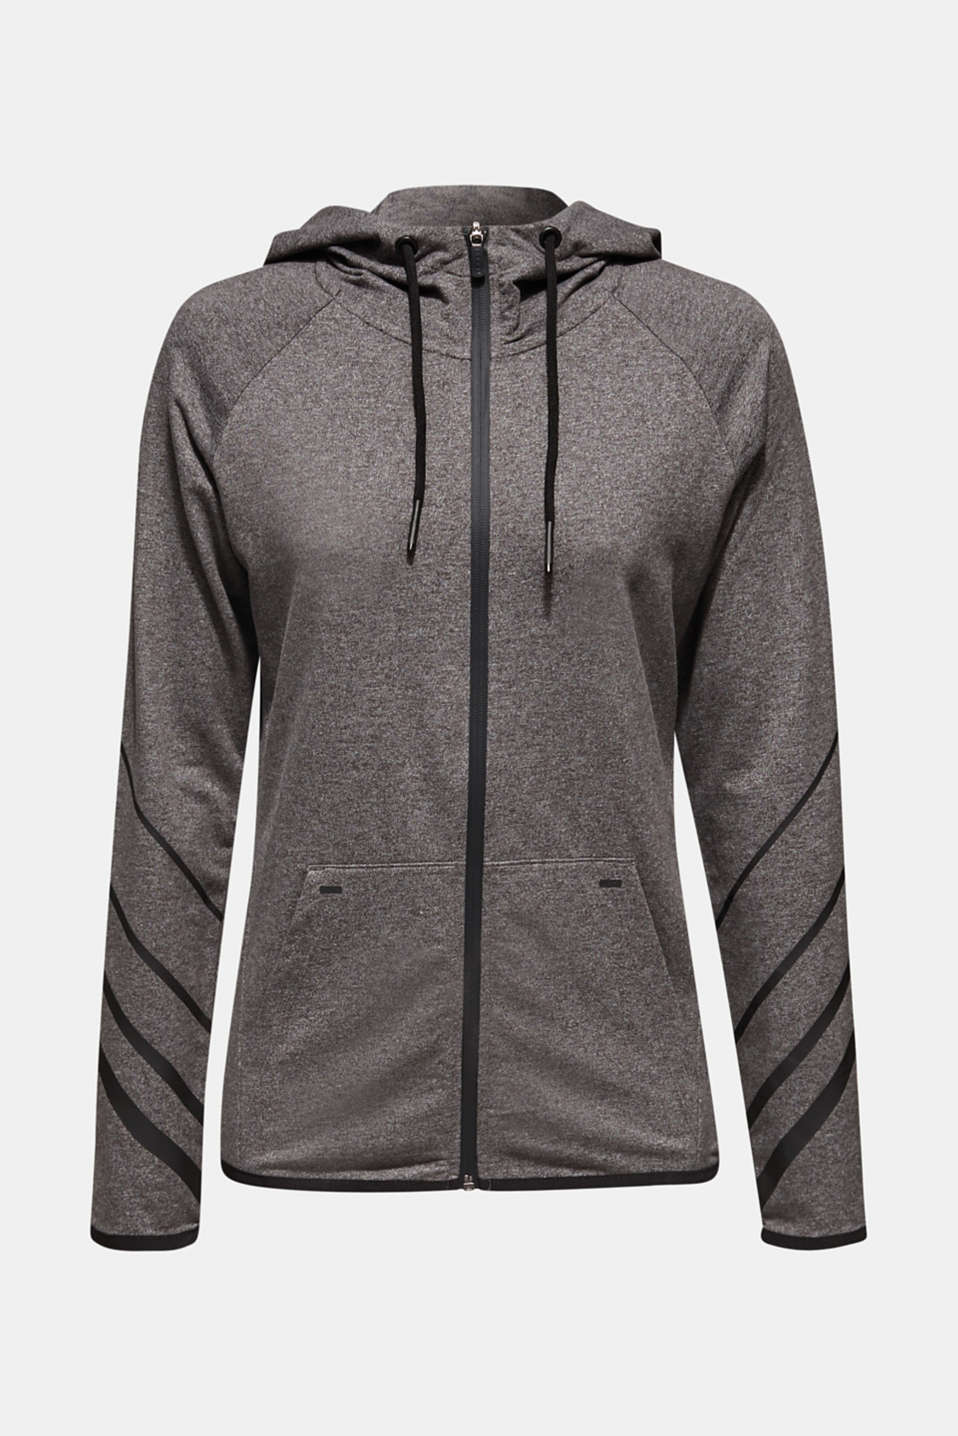 Hooded sweatshirt cardigan, ANTHRACITE 2, detail image number 5